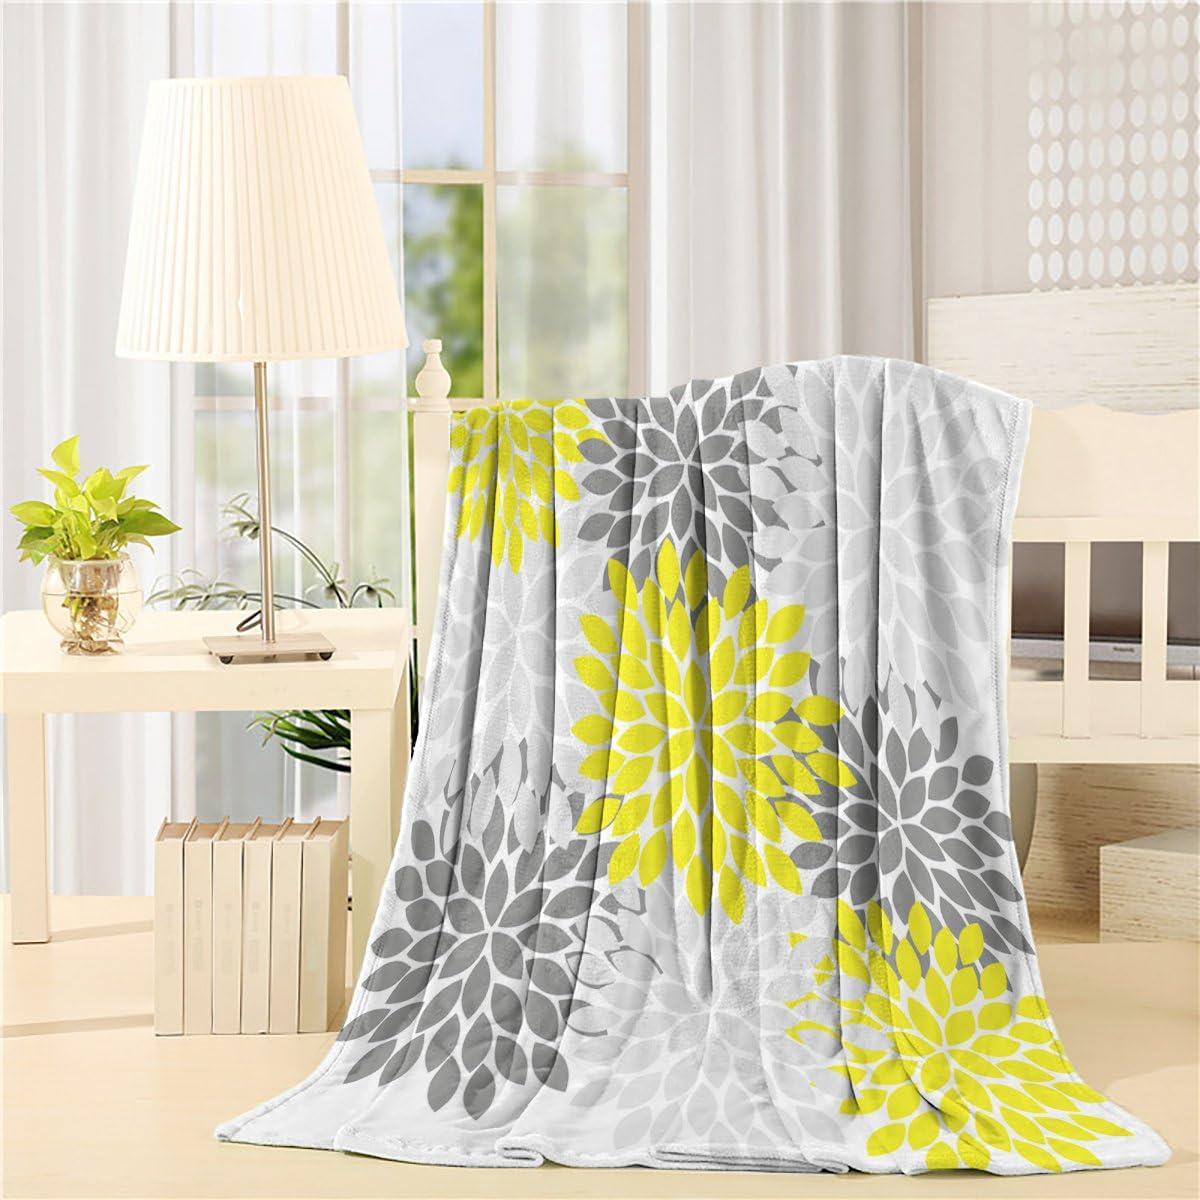 SUN-Shine Flannel Fleece Luxury Blanket Home Multicolor Dahlia Pinnata Flower Throw Lightweight Cozy Plush Microfiber Colorful Blanket 40x50Inches Black, Yellow, Grey